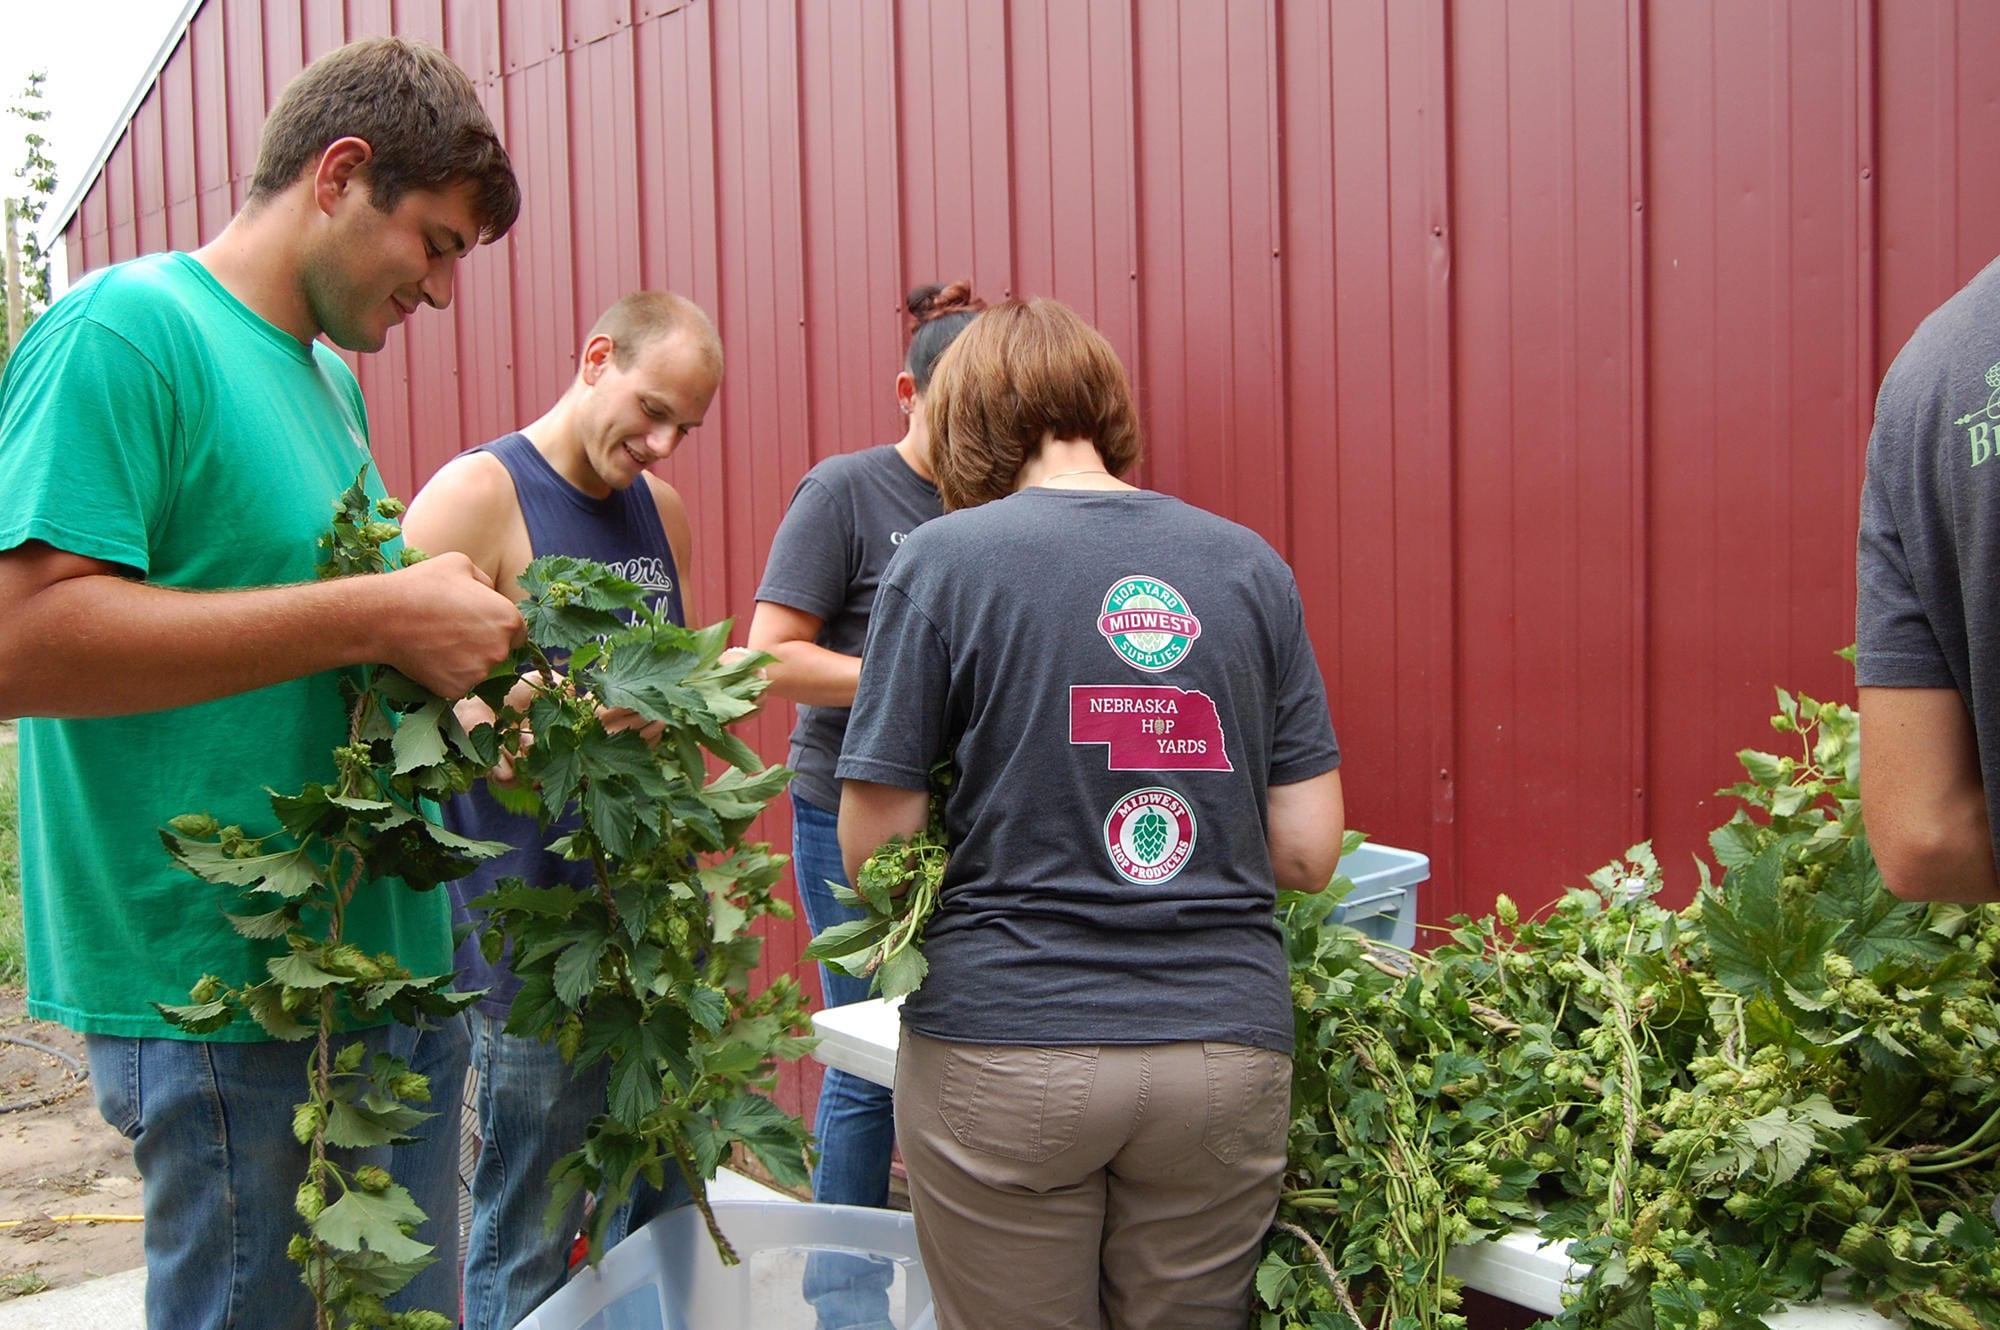 People picking hops.